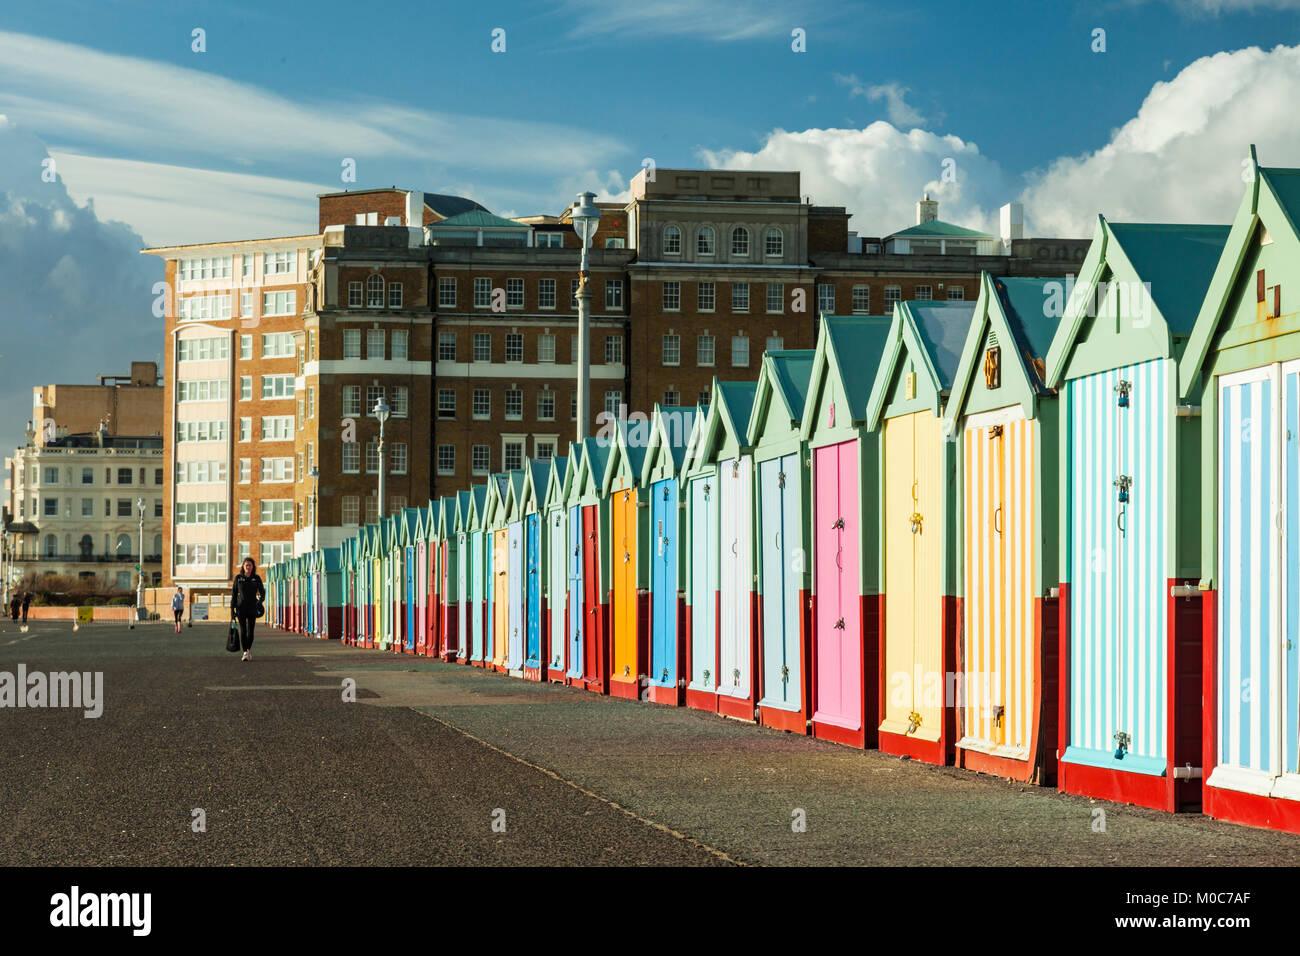 Colour beach huts on Brighton seafront, England. - Stock Image